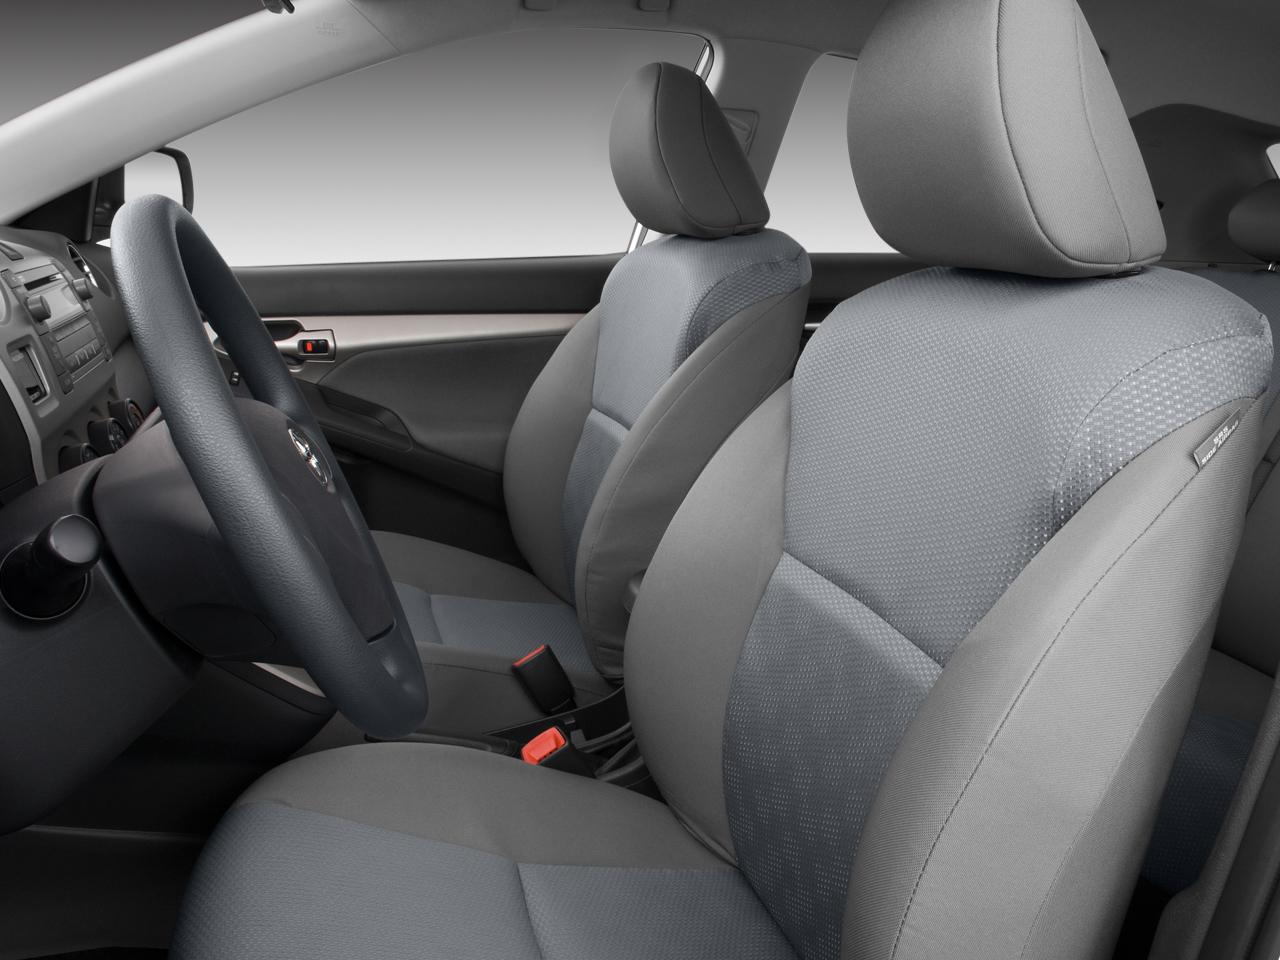 Toyota toyota matrix awd manual transmission : 2009 Toyota Matrix XRS - Toyota Midsize Hatchback Review ...